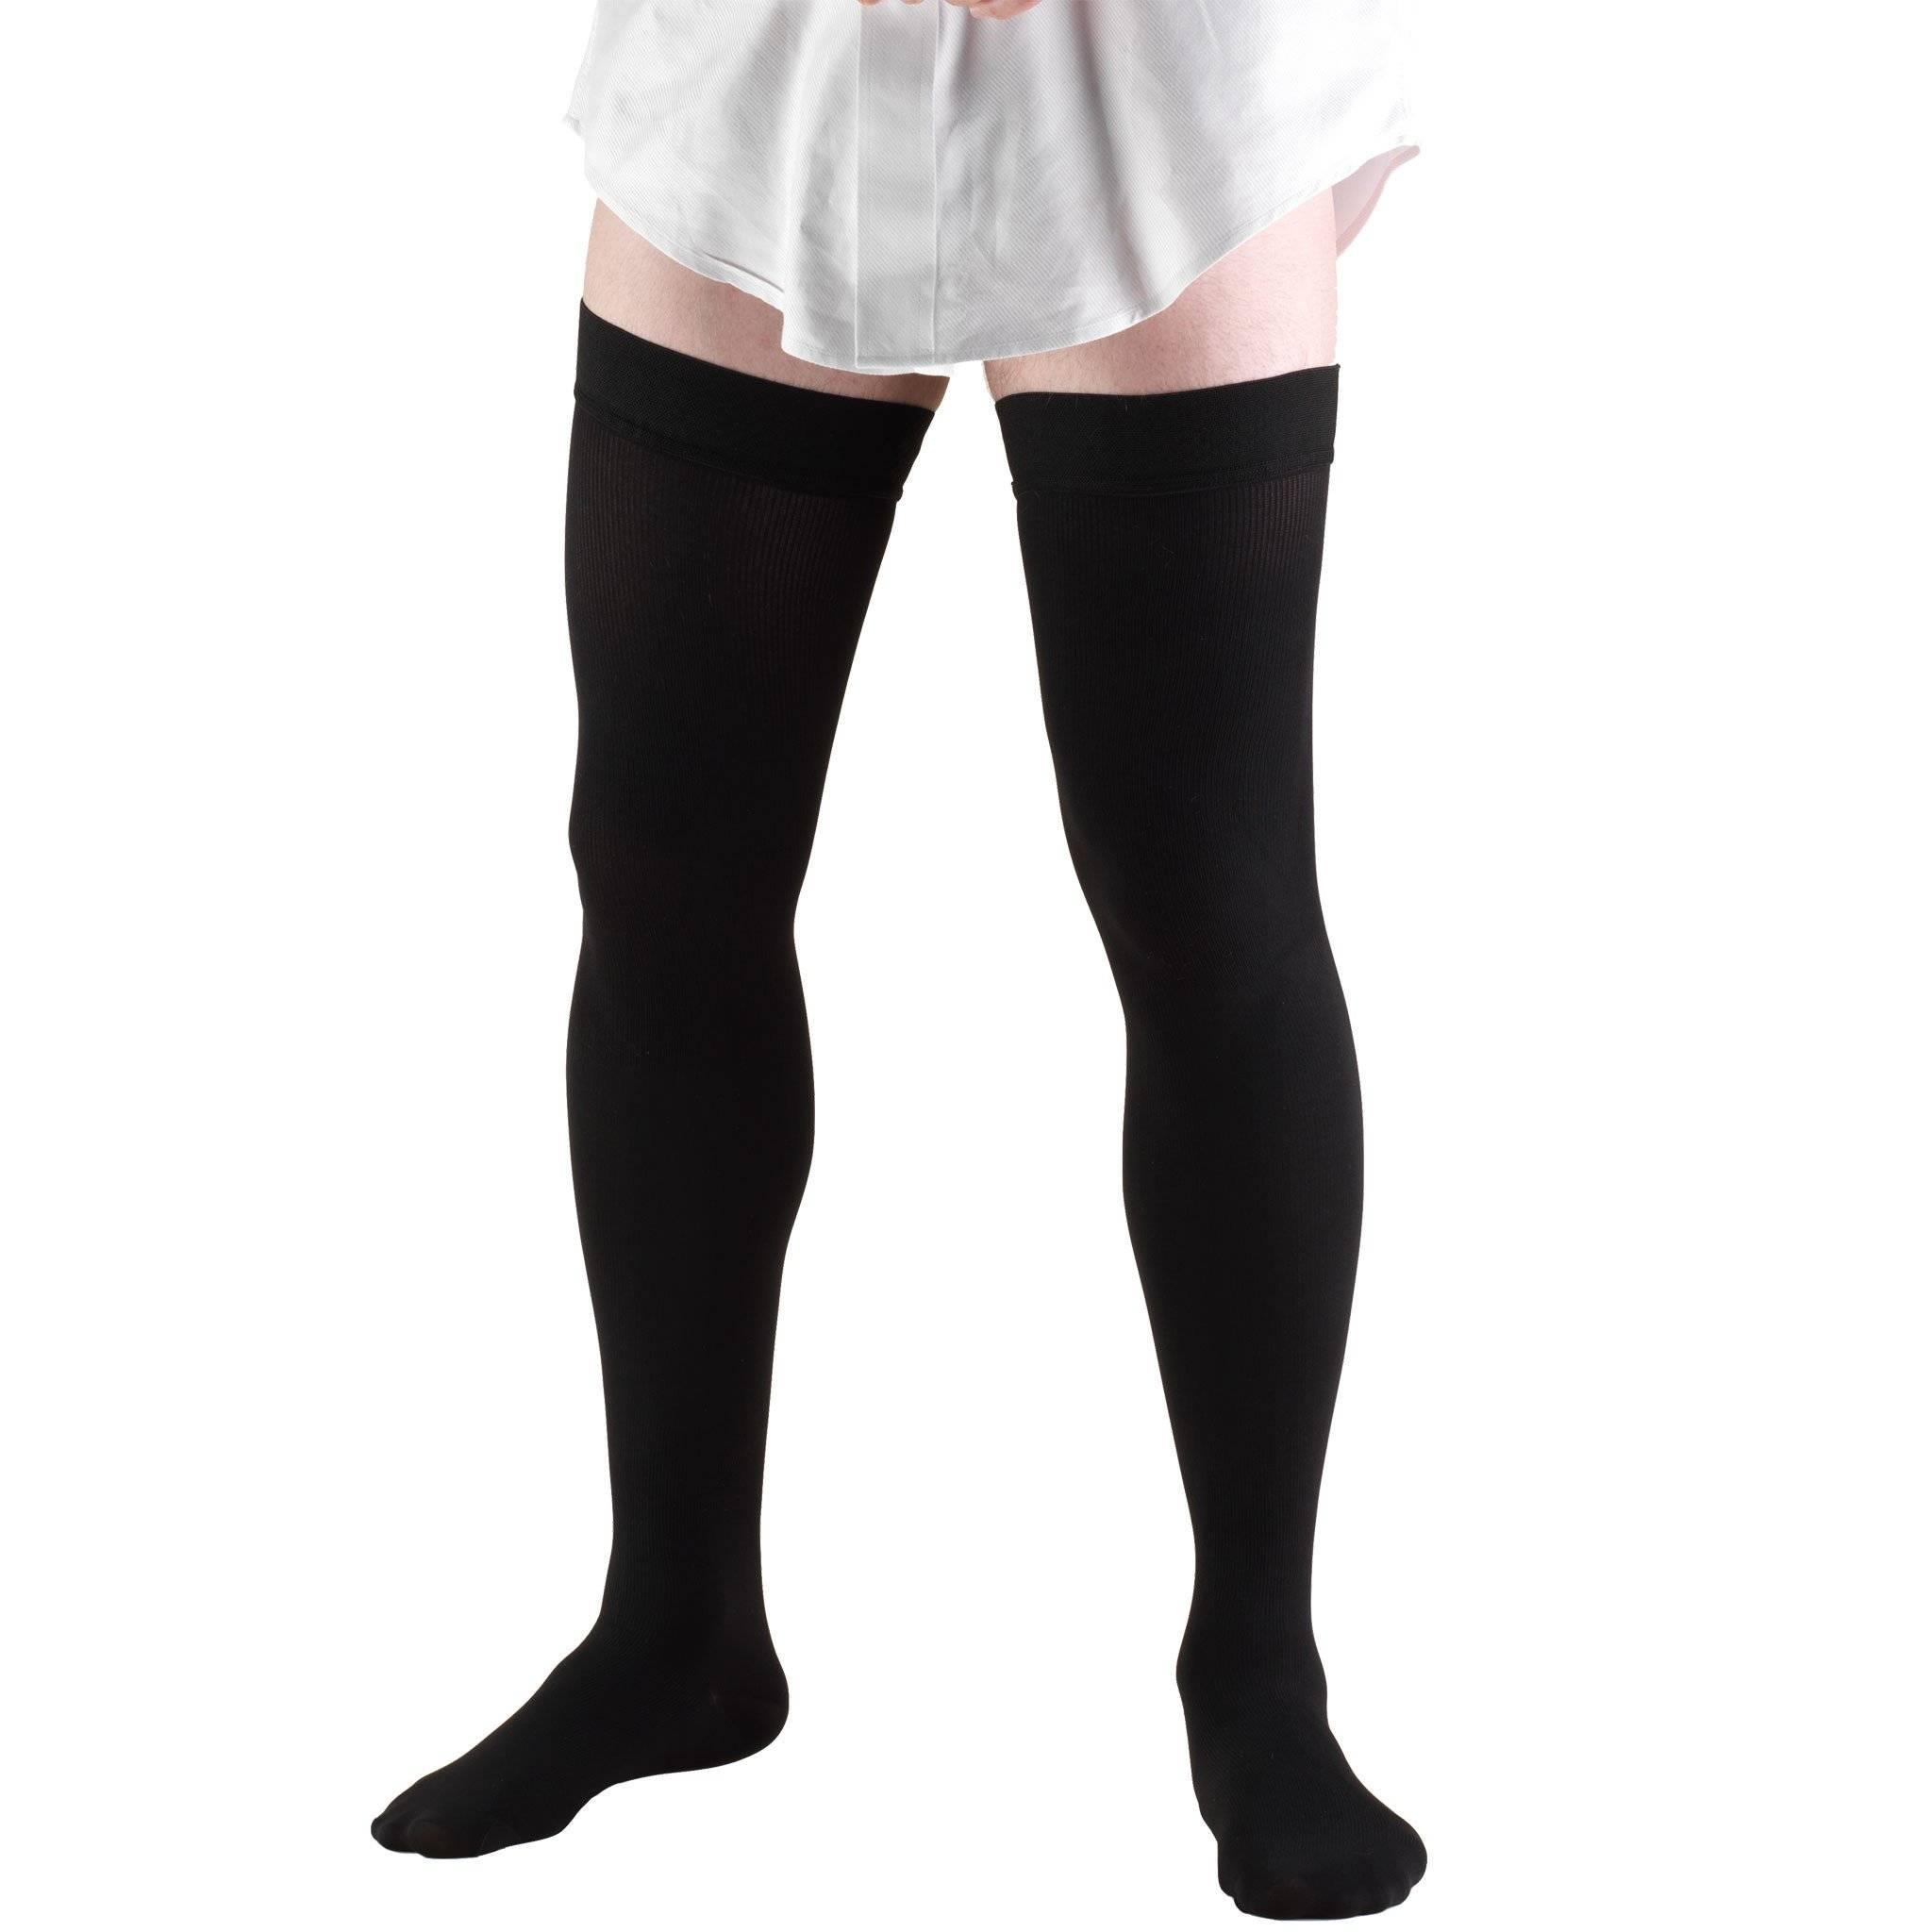 Men's Thigh High Dress Socks